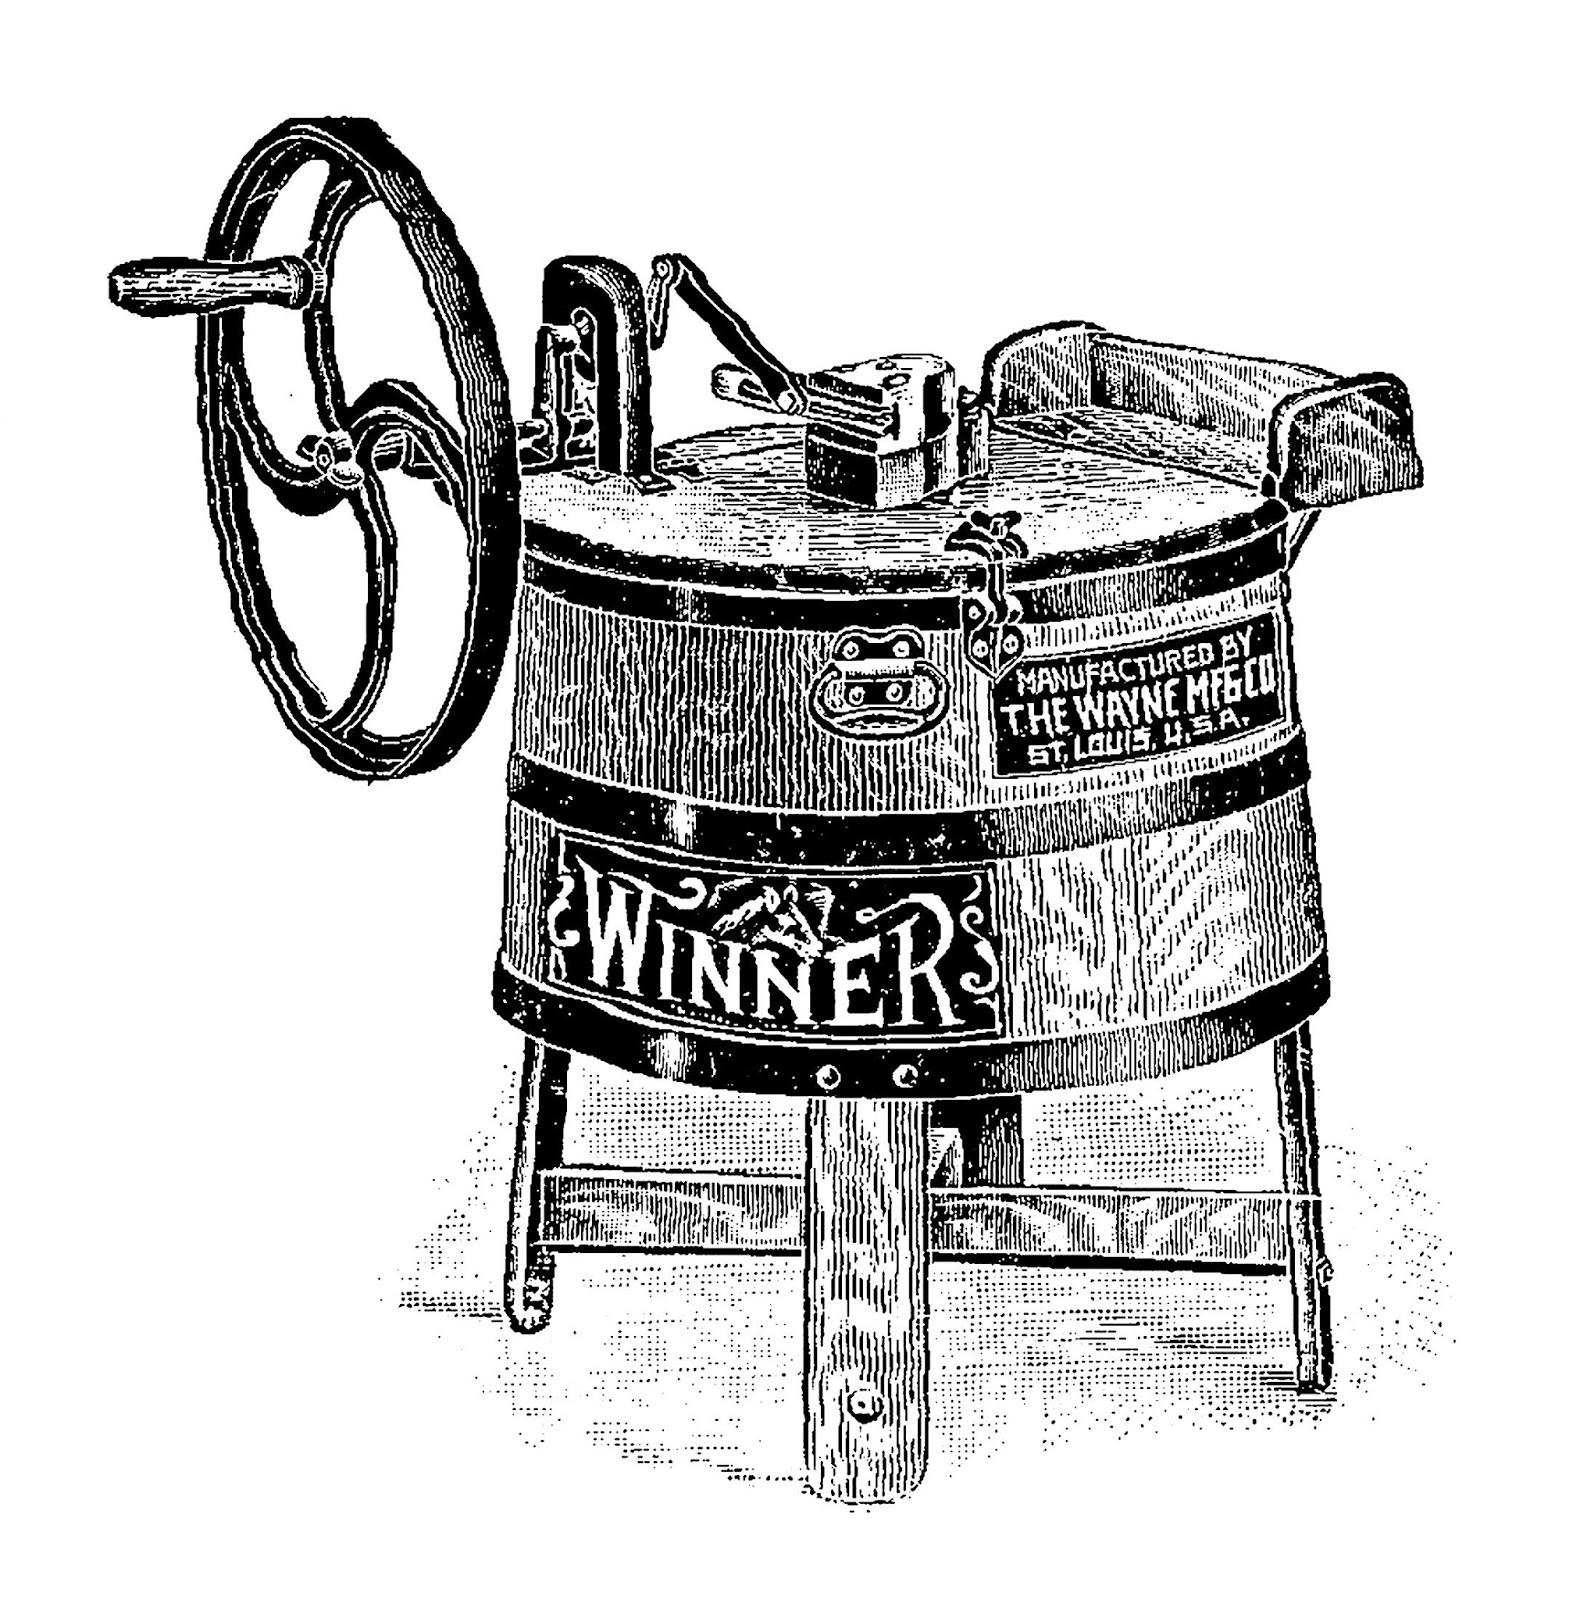 Vintage washing machine clipart clip art freeuse library Antique Images: Digital Image Transfer of Vintage Washing ... clip art freeuse library